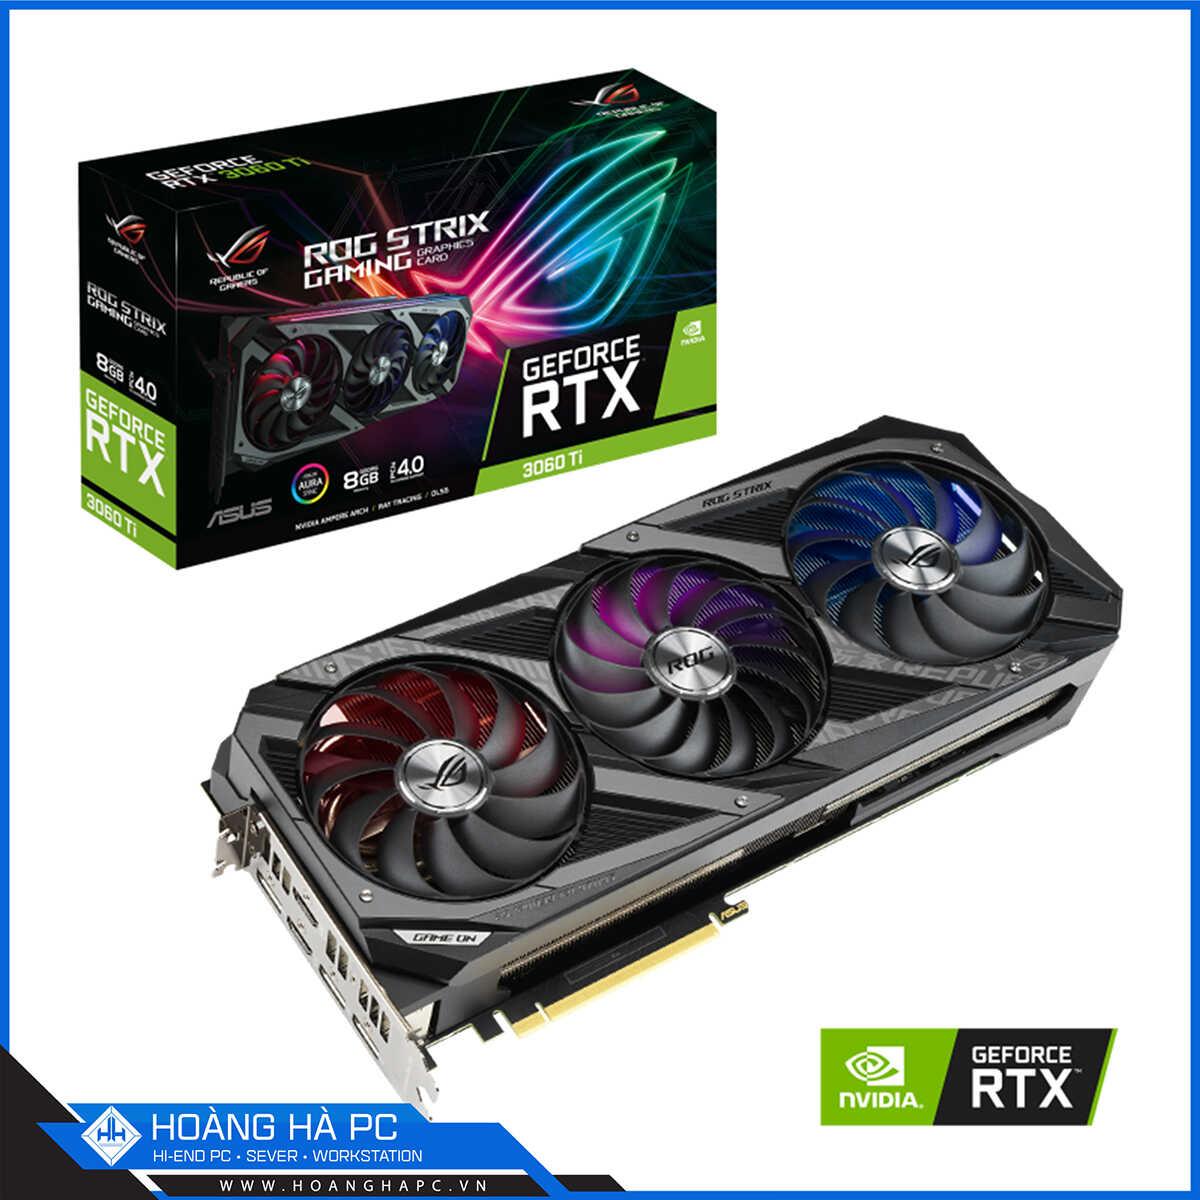 ASUS ROG STRIX RTX 3060 Ti 8GB